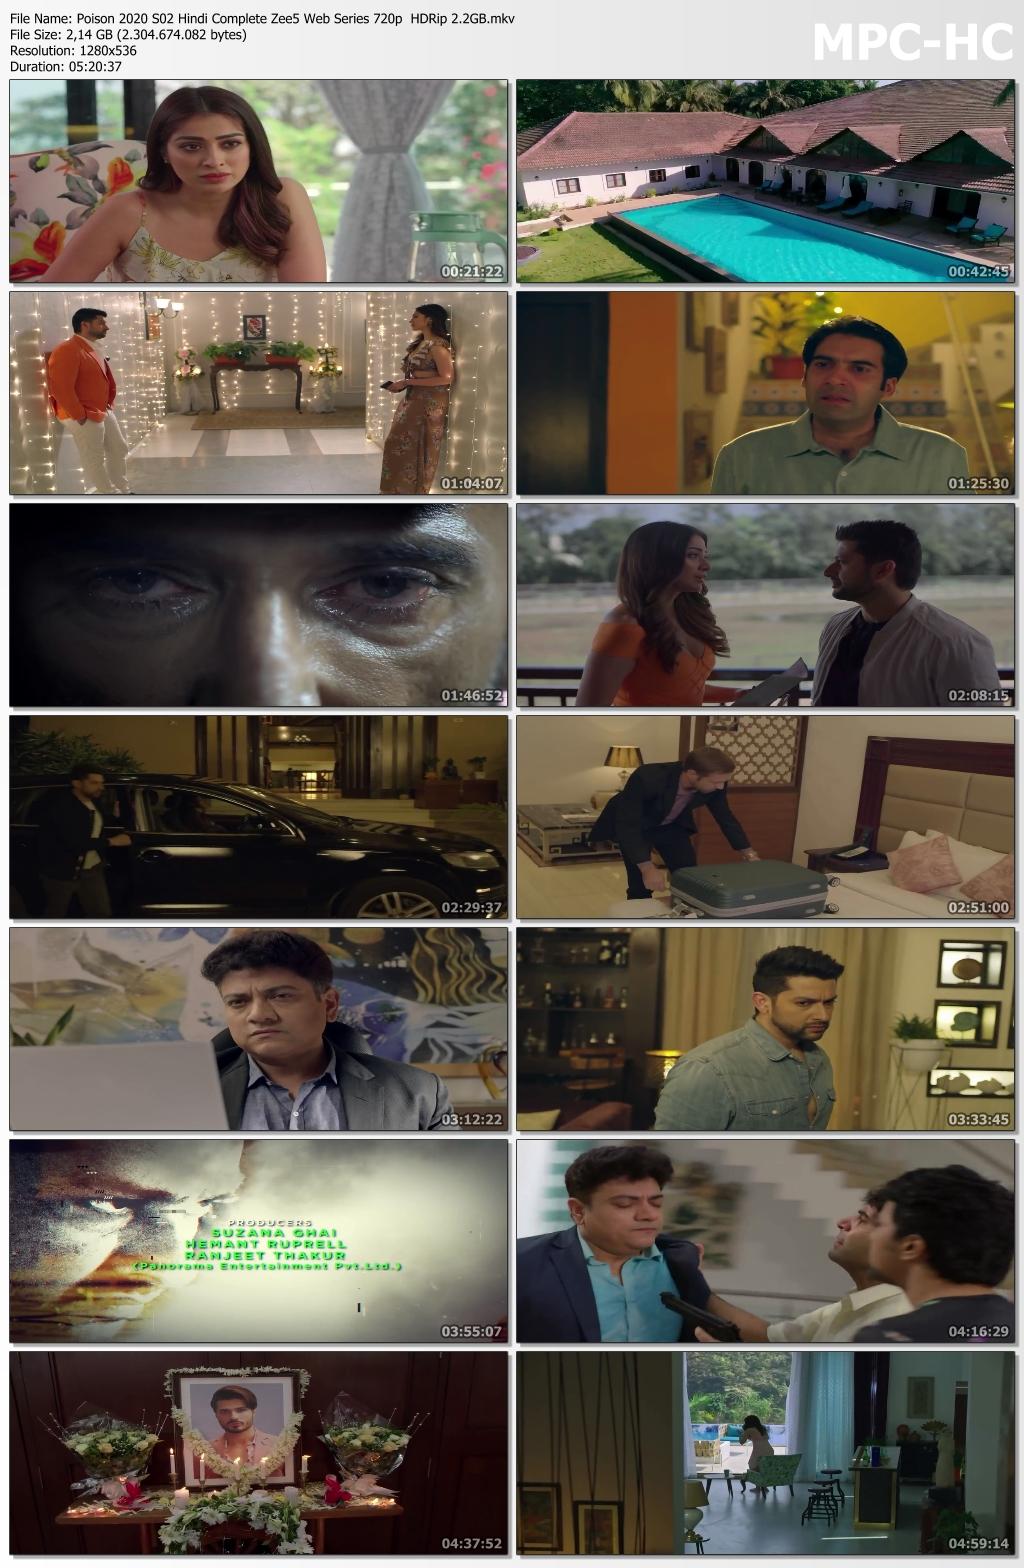 Poison-2020-S02-Hindi-Complete-Zee5-Web-Series-720p-HDRip-2-2-GB-mkv-thumbs